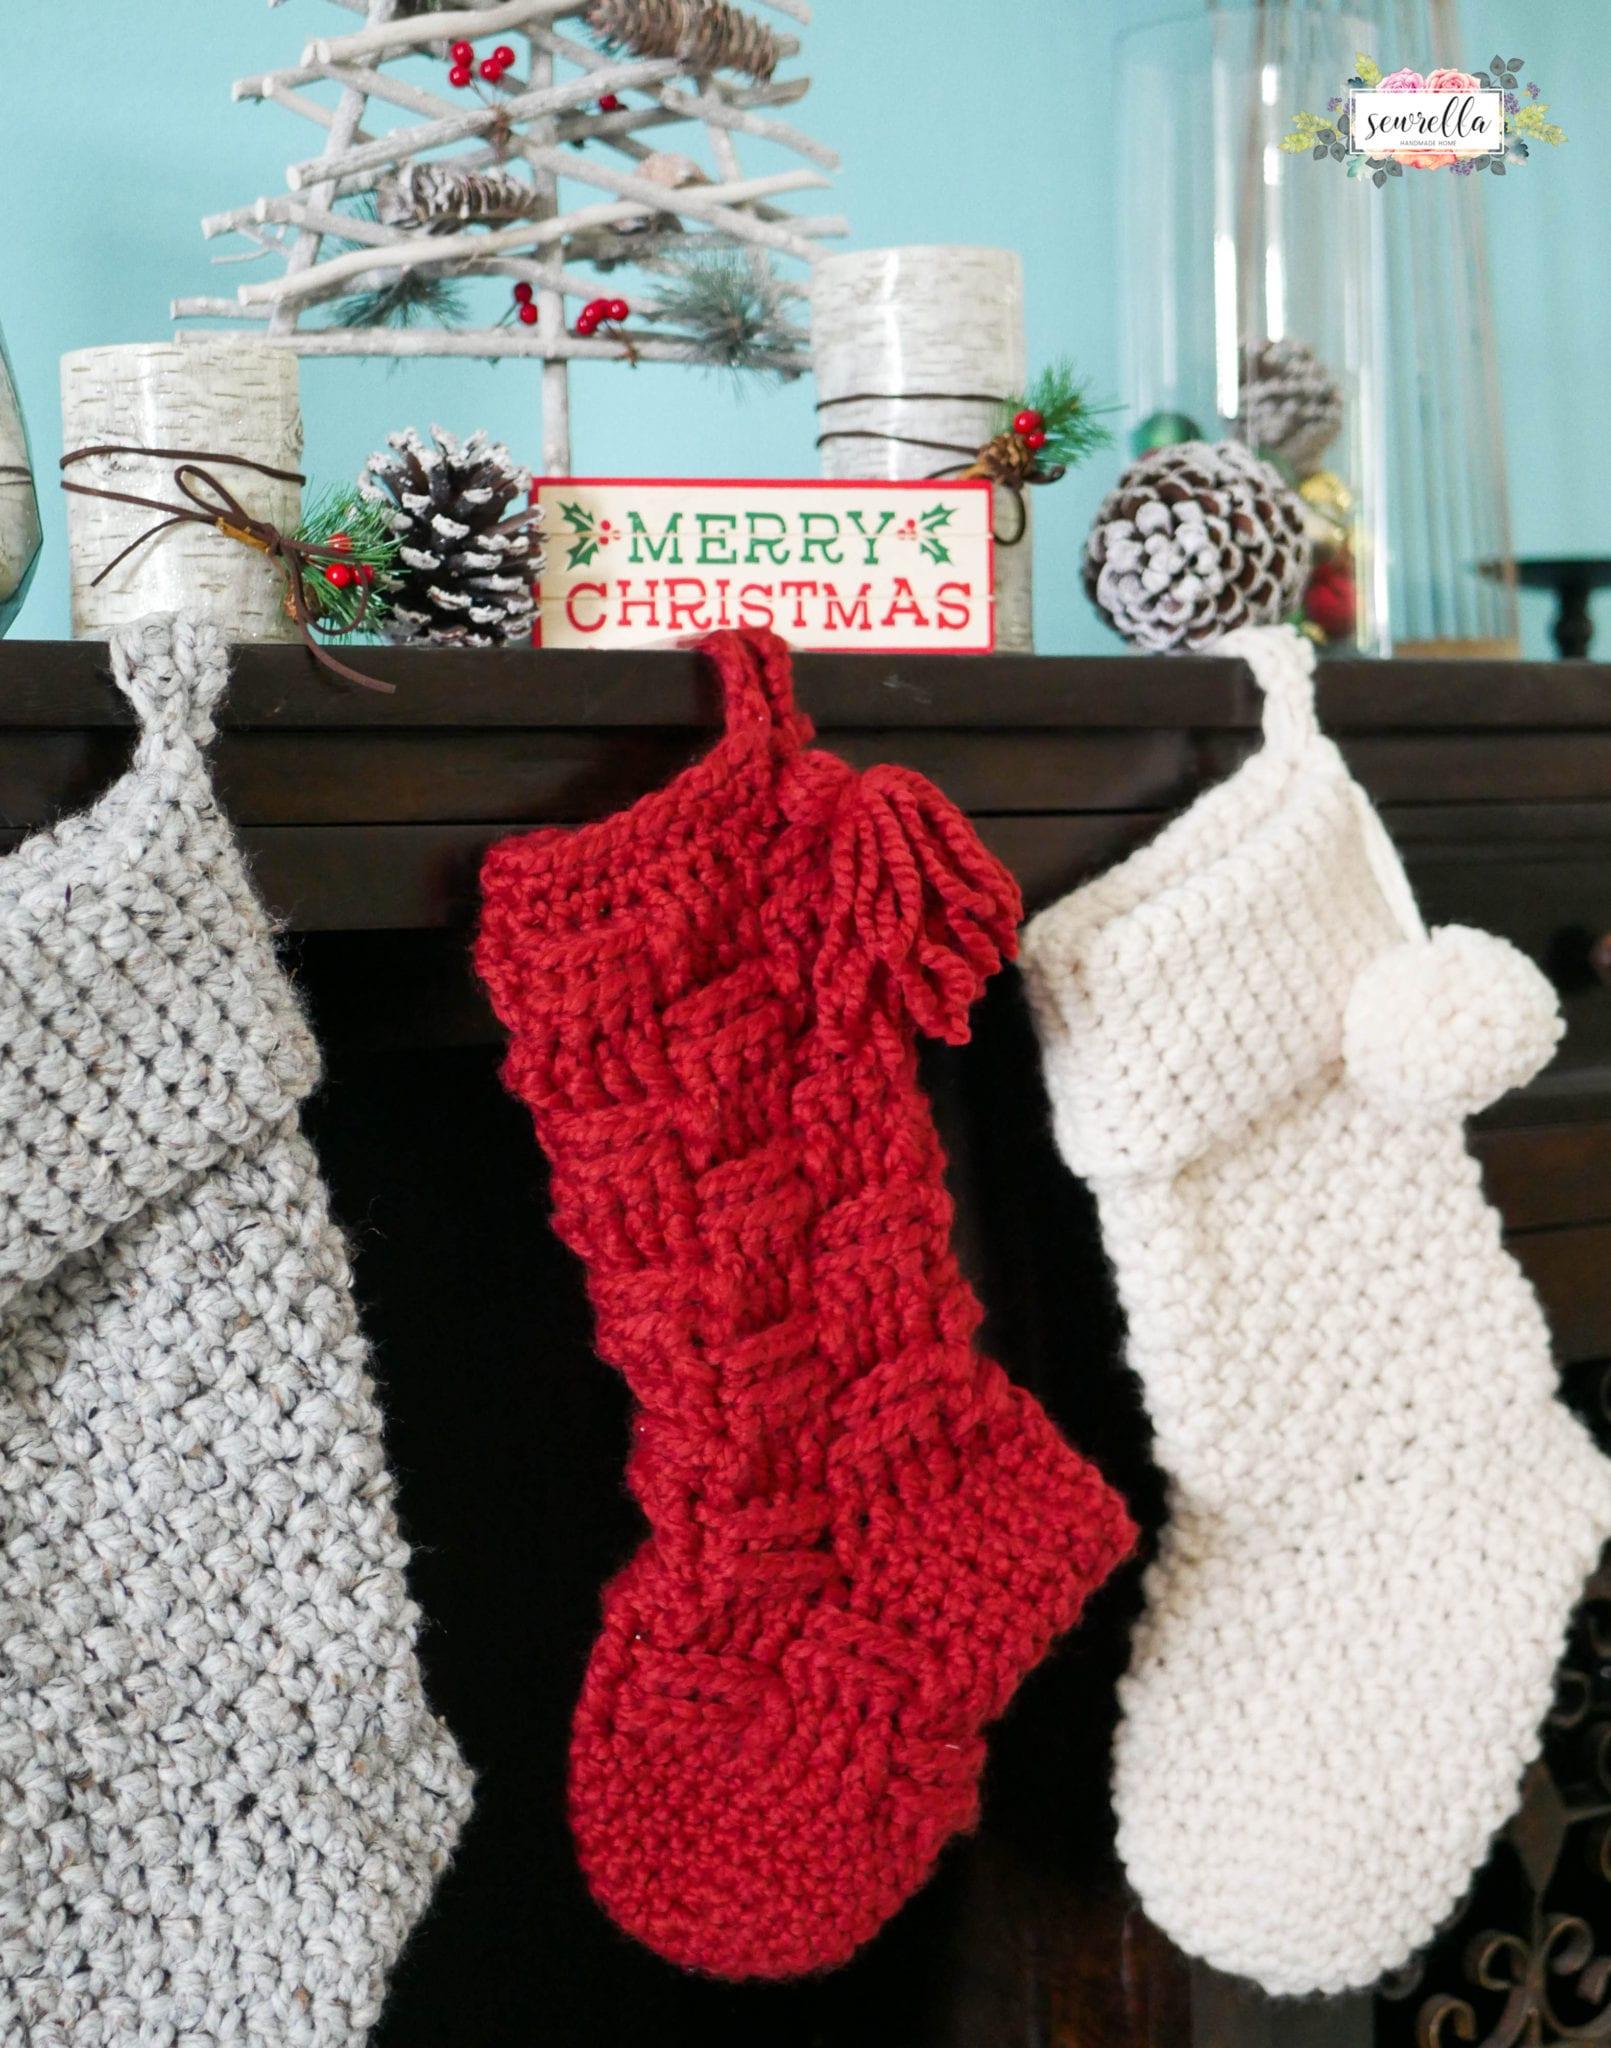 Jumbo Crochet Christmas Stockings - Sewrella